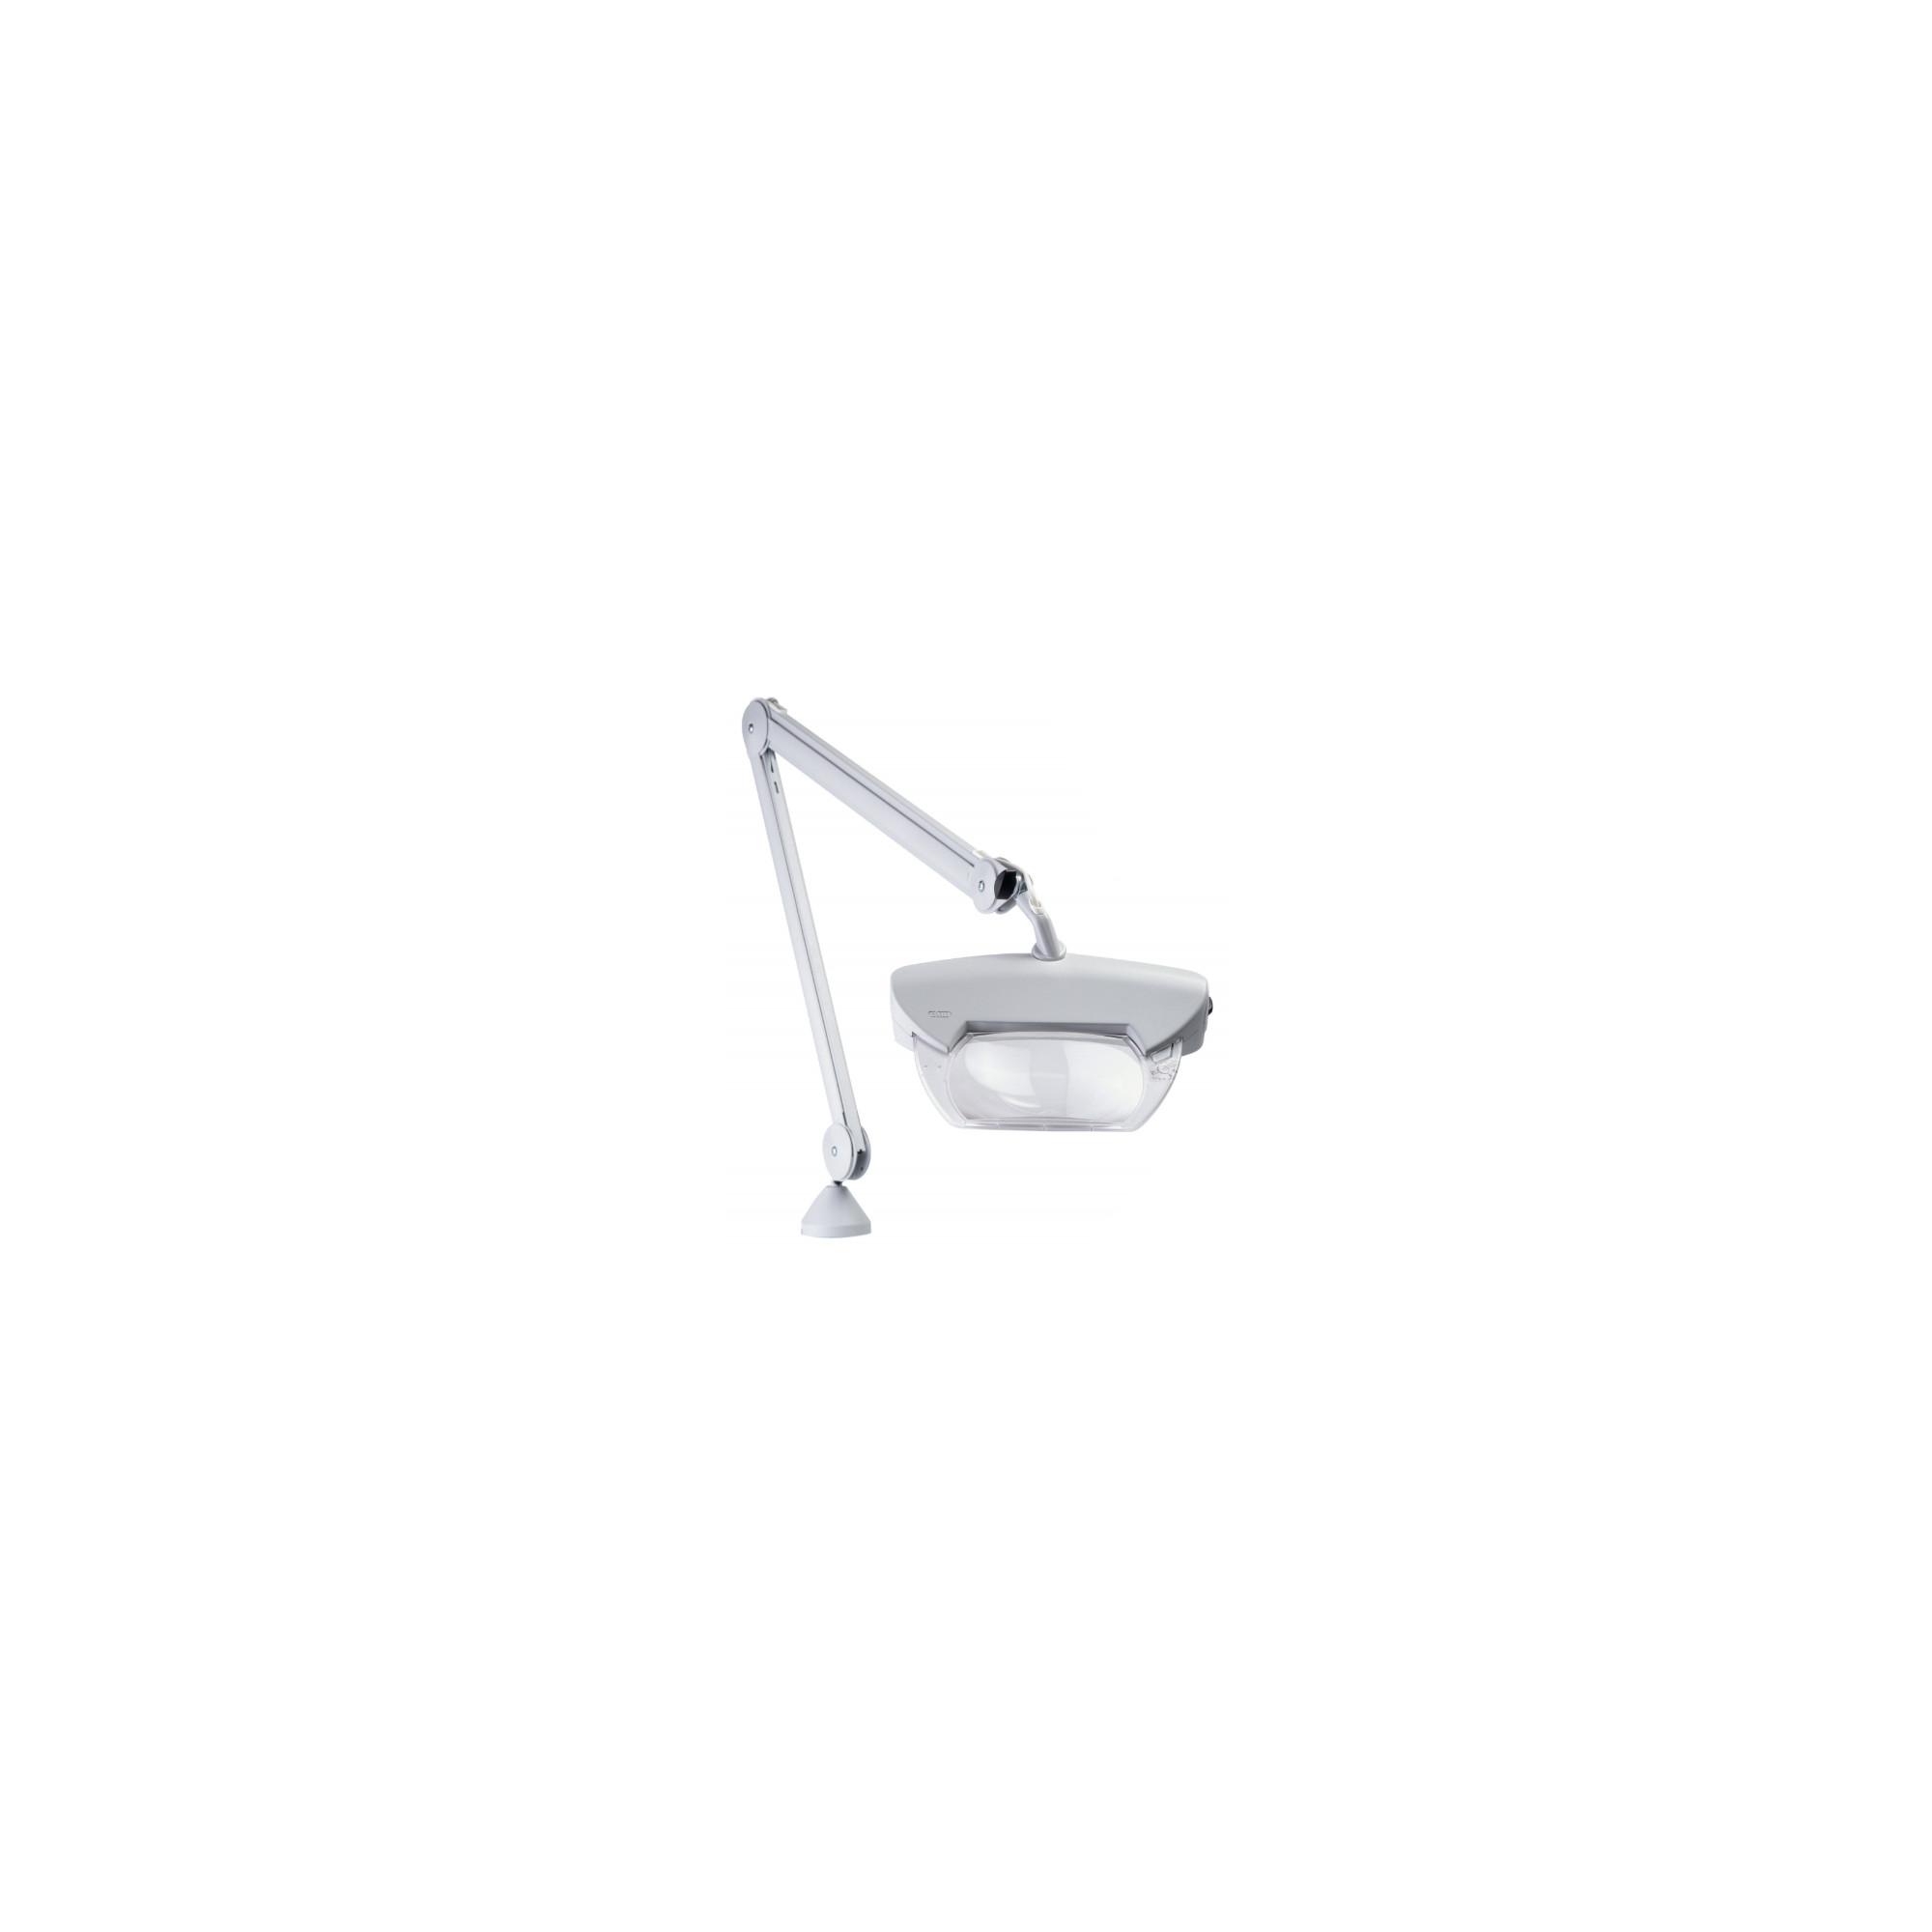 Lampe loupe articulée MAGNIFIQUE II - 11W - 3 dioptries